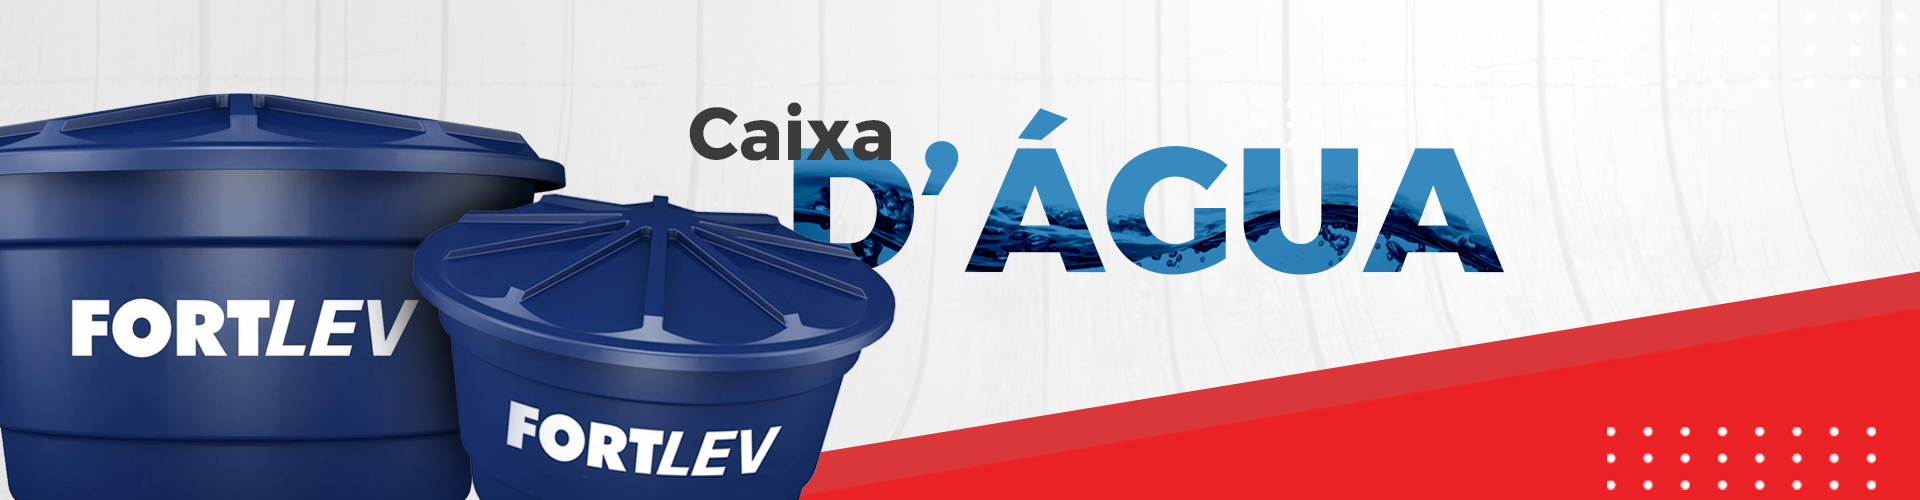 banner-caixa_dagua